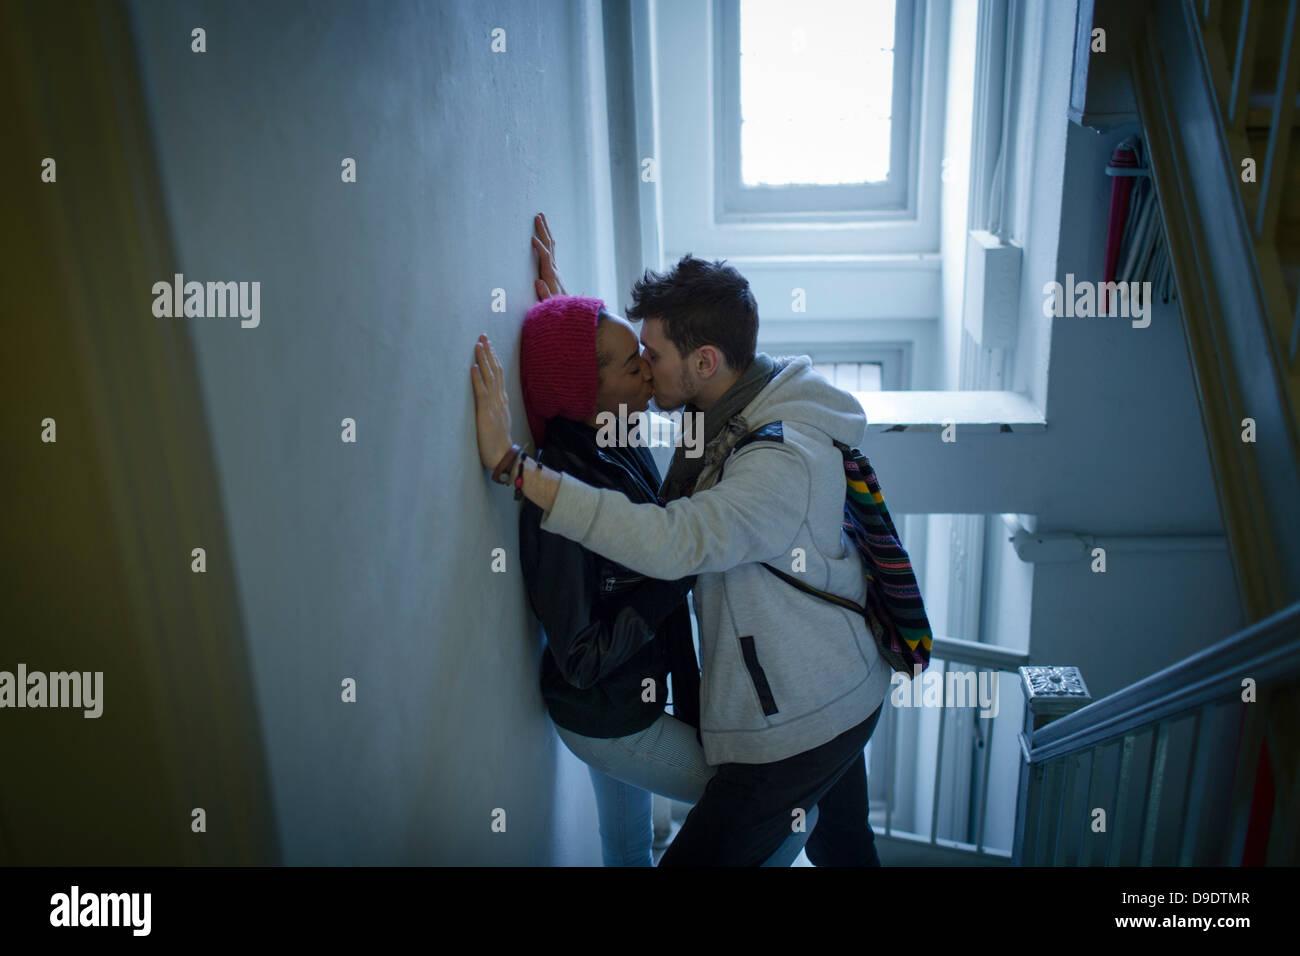 Pareja joven abrazando en pasillo Foto de stock